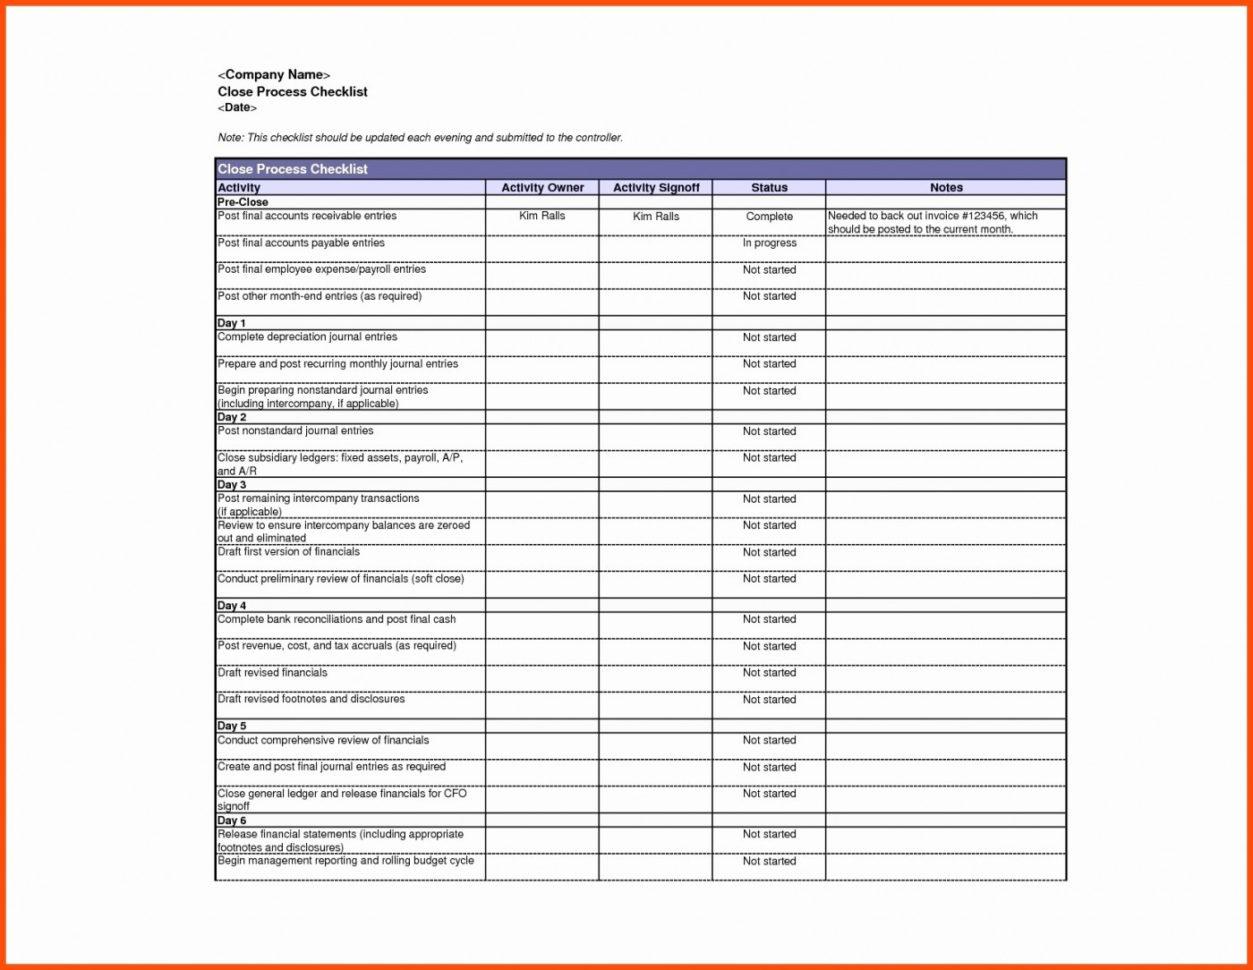 Florida Financial Affidavit Excel Spreadsheet Inside 021 Probate Accounting Template Excel Ideas Spreadsheet Beautiful